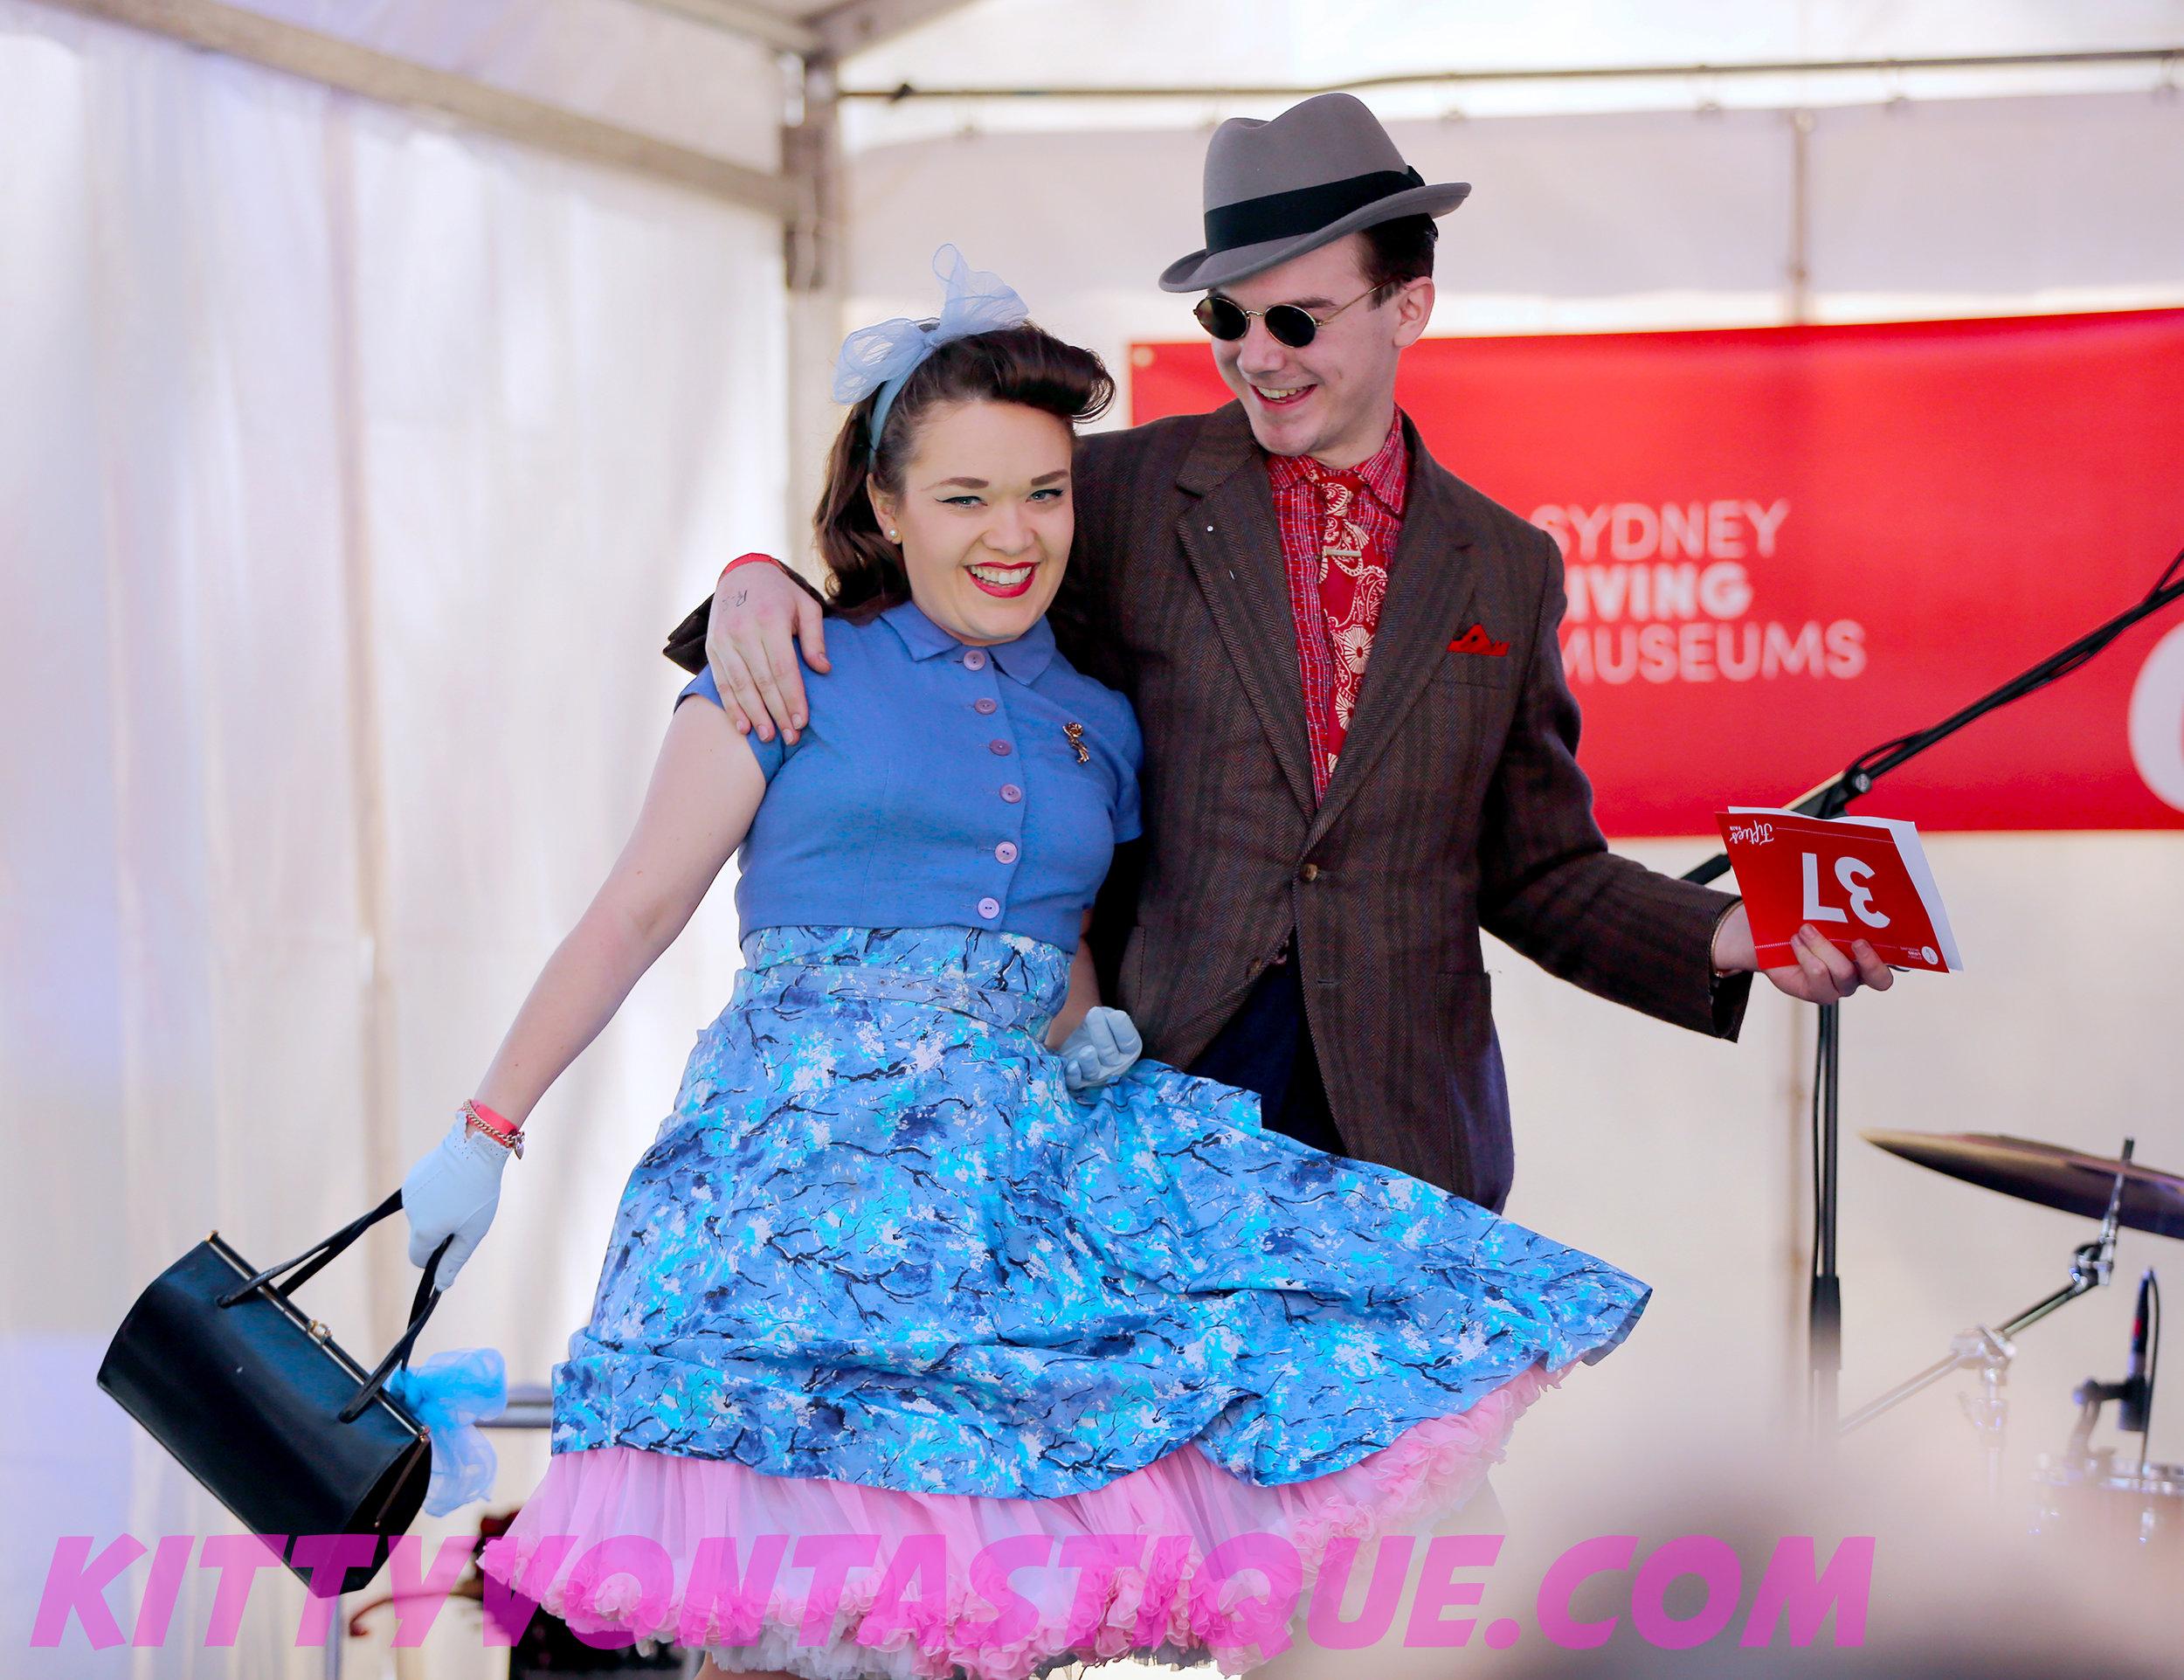 Scott&Laura_1 copy.jpg